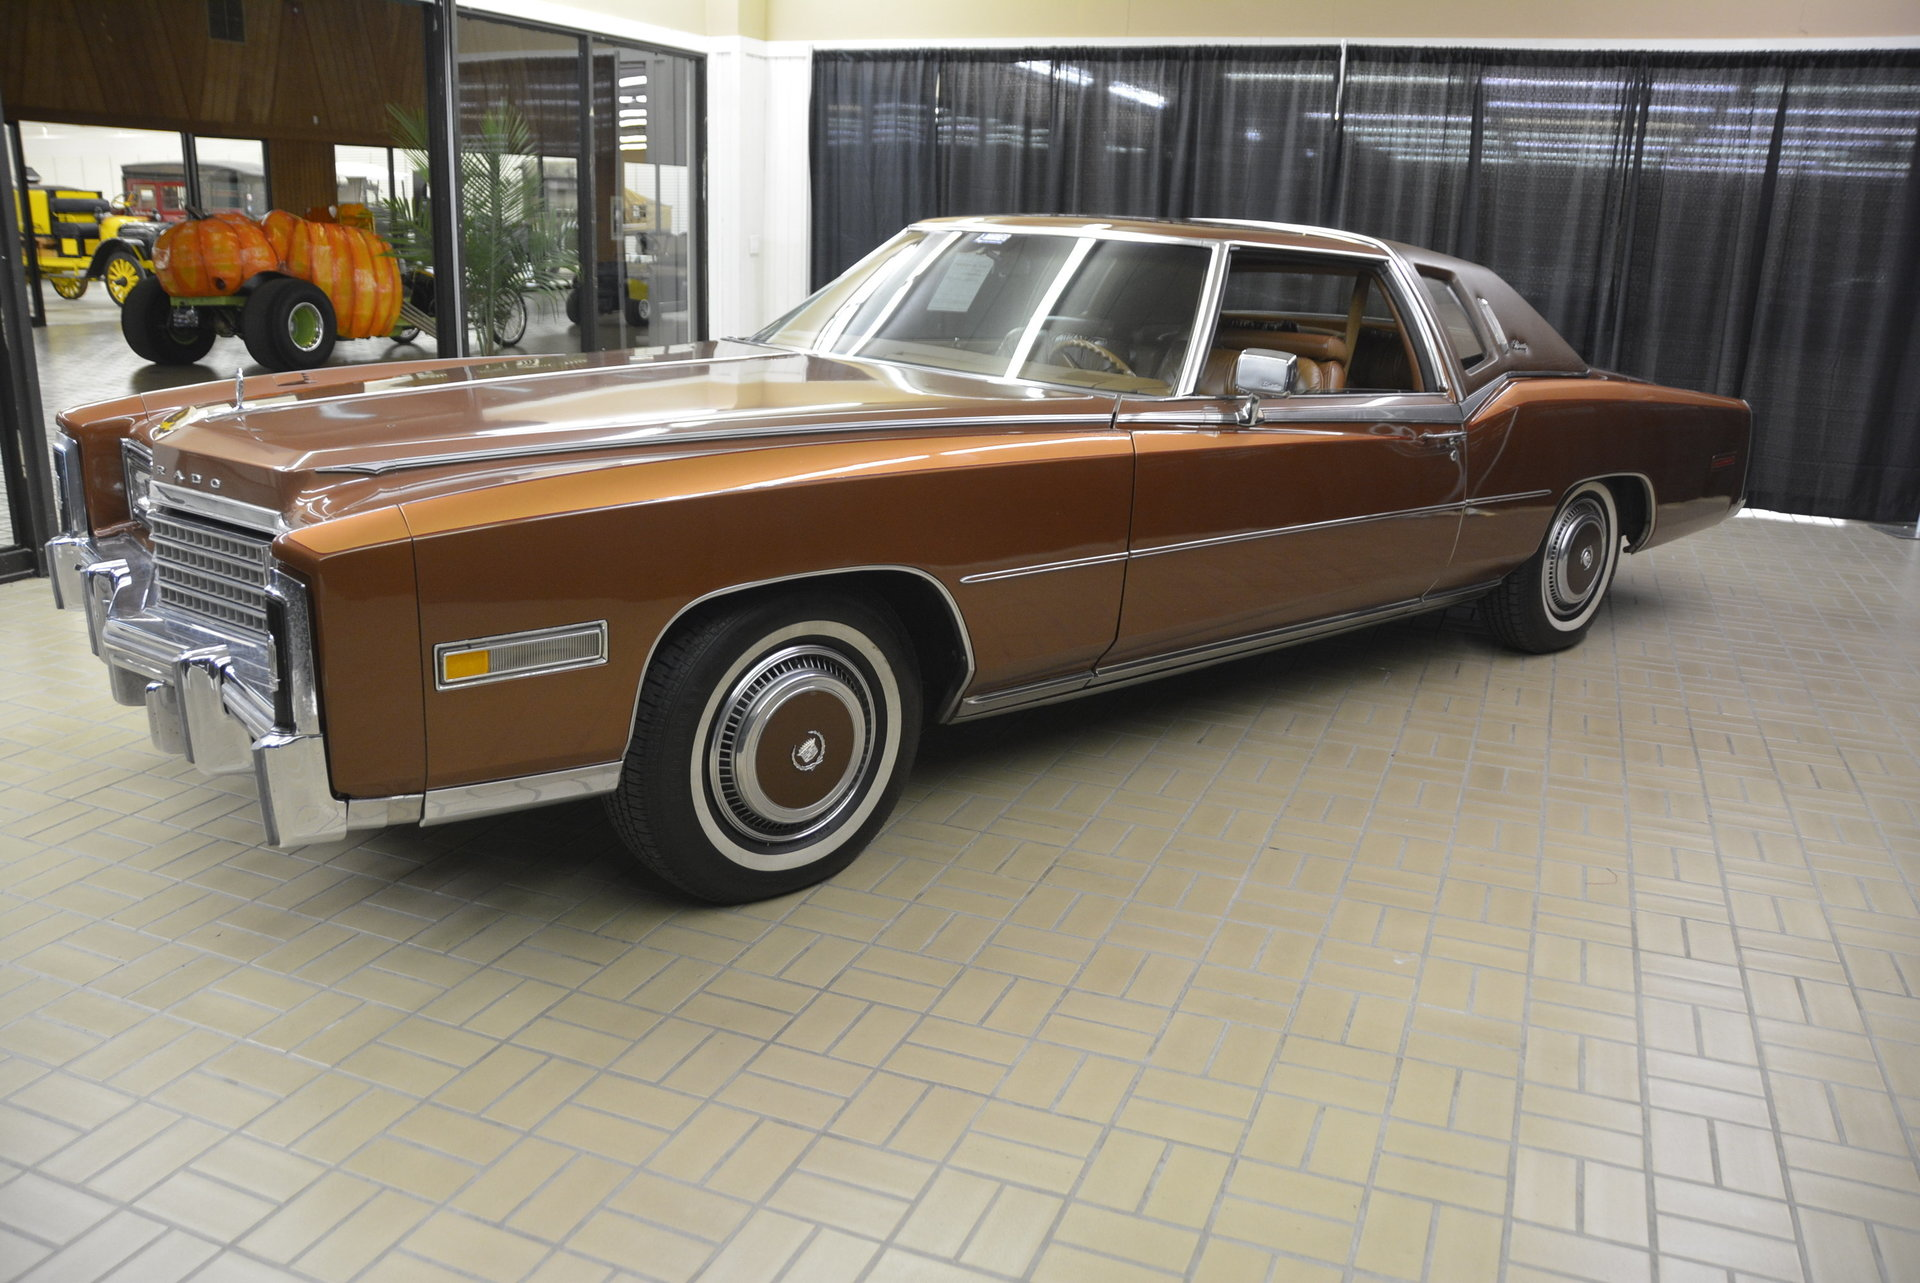 1978 Cadillac Eldorado Classic Auto Mall Sedan Deville Biarritz